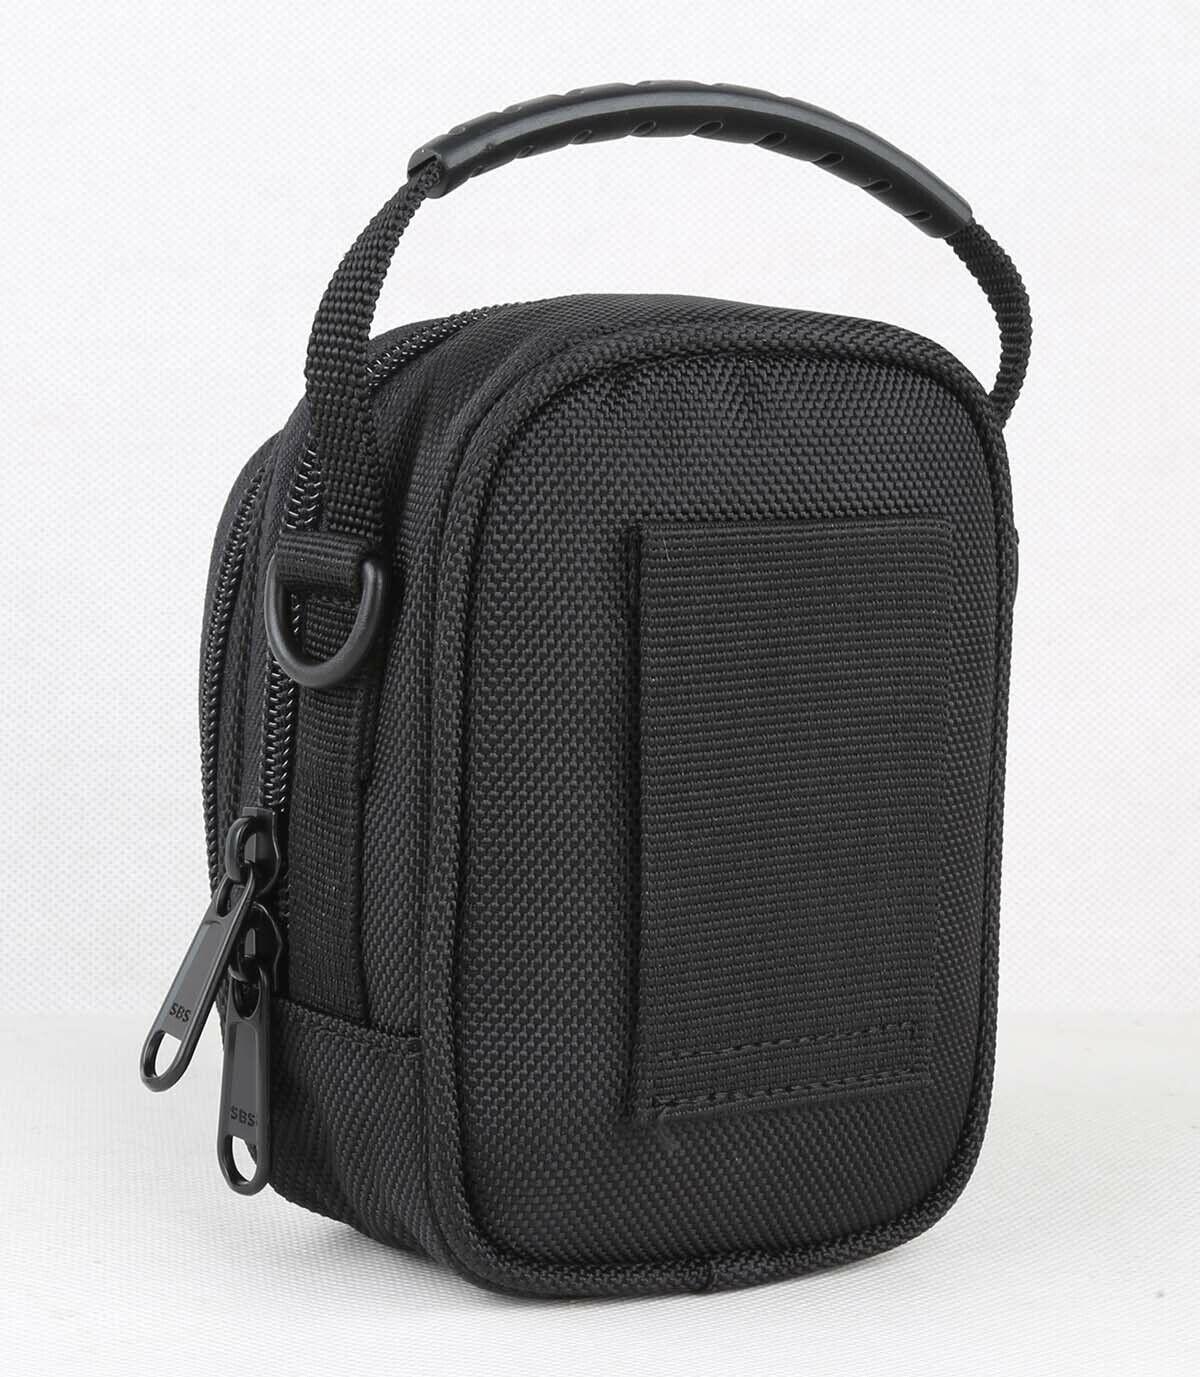 Shoulder Waist Camera Case Bag For SONY Cyber-Shot DSC RX100 VI, RX100 V/RX100M5